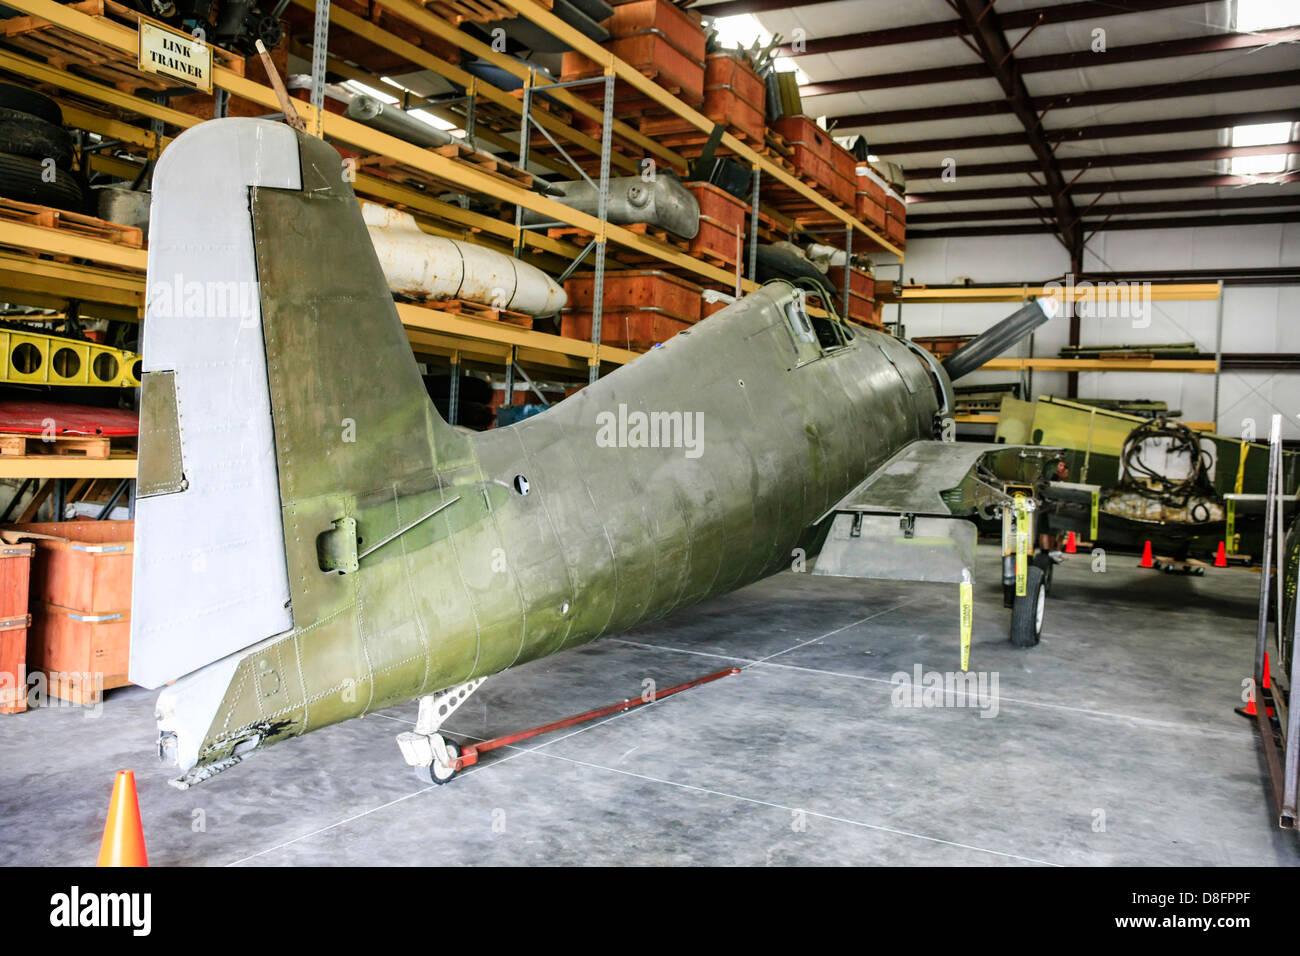 A semi-restored Hellcat in the Storage Hangar at the Fantasy of Flight Museum FL - Stock Image